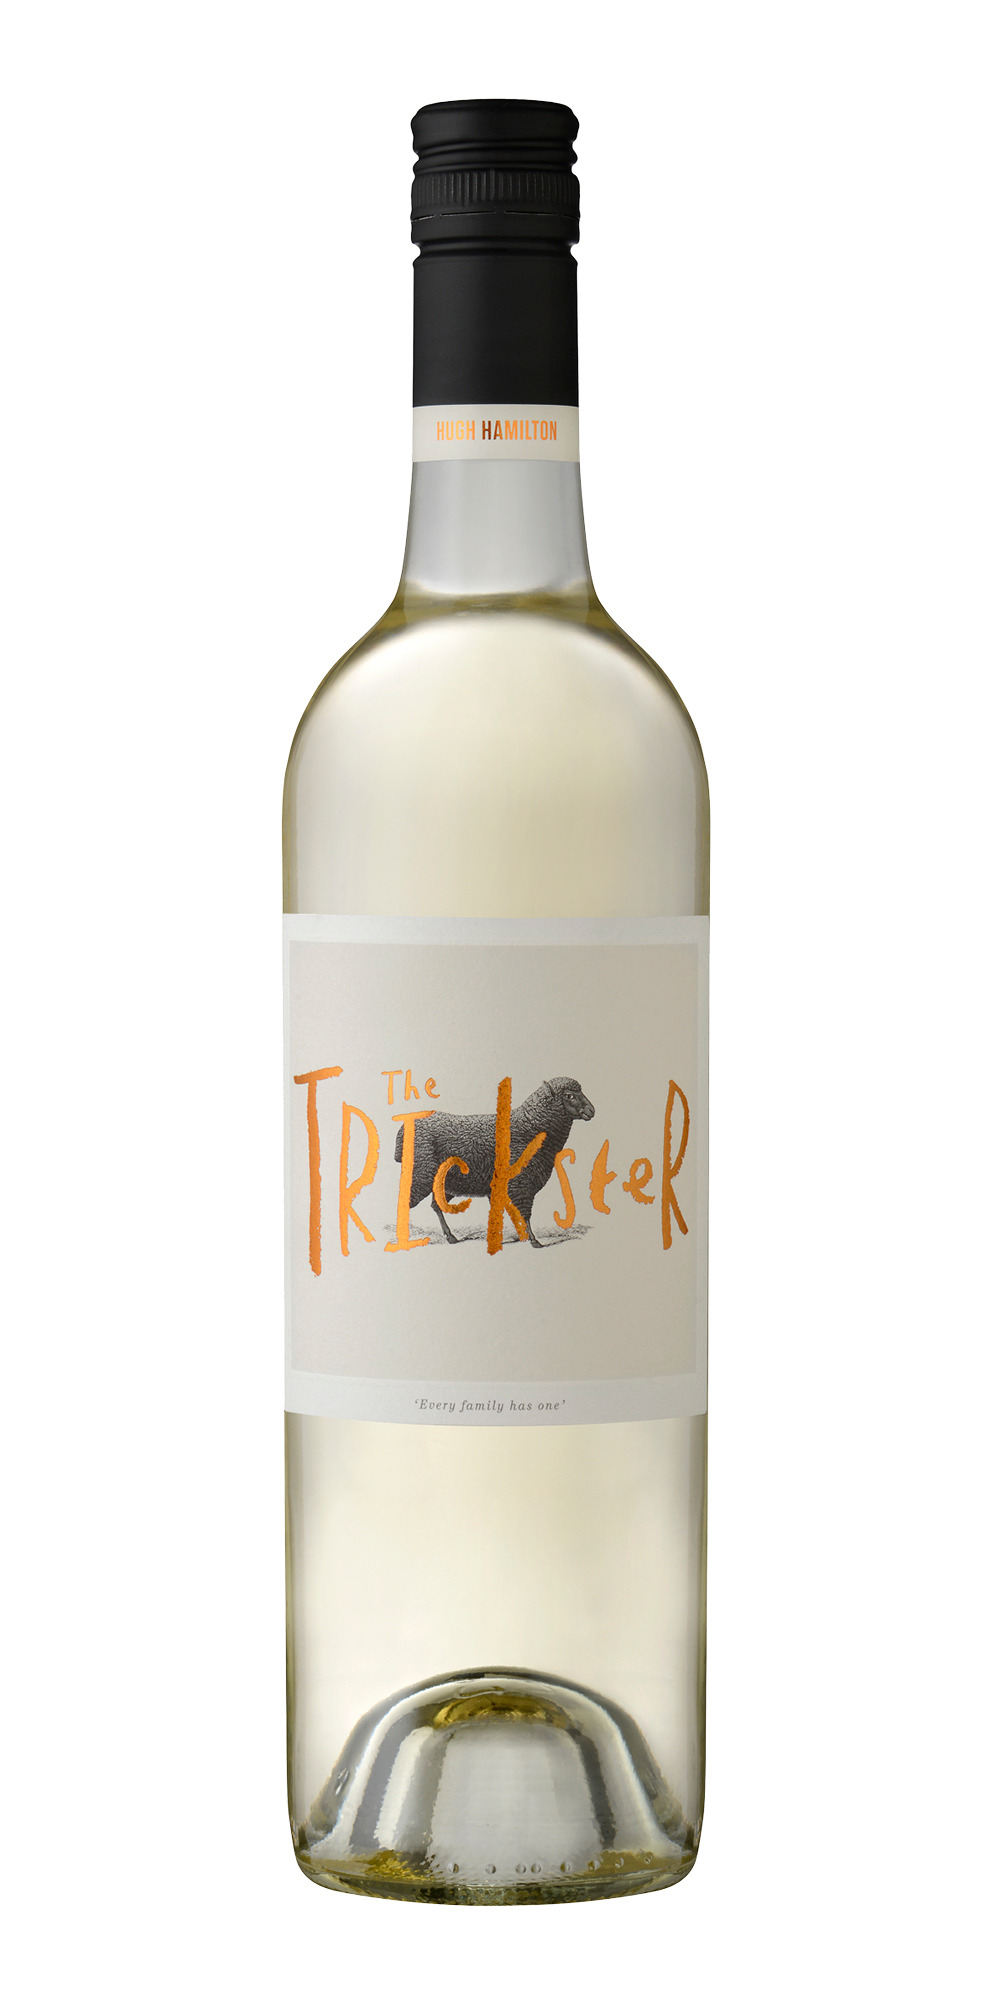 'The Trickster' Pinot Grigio